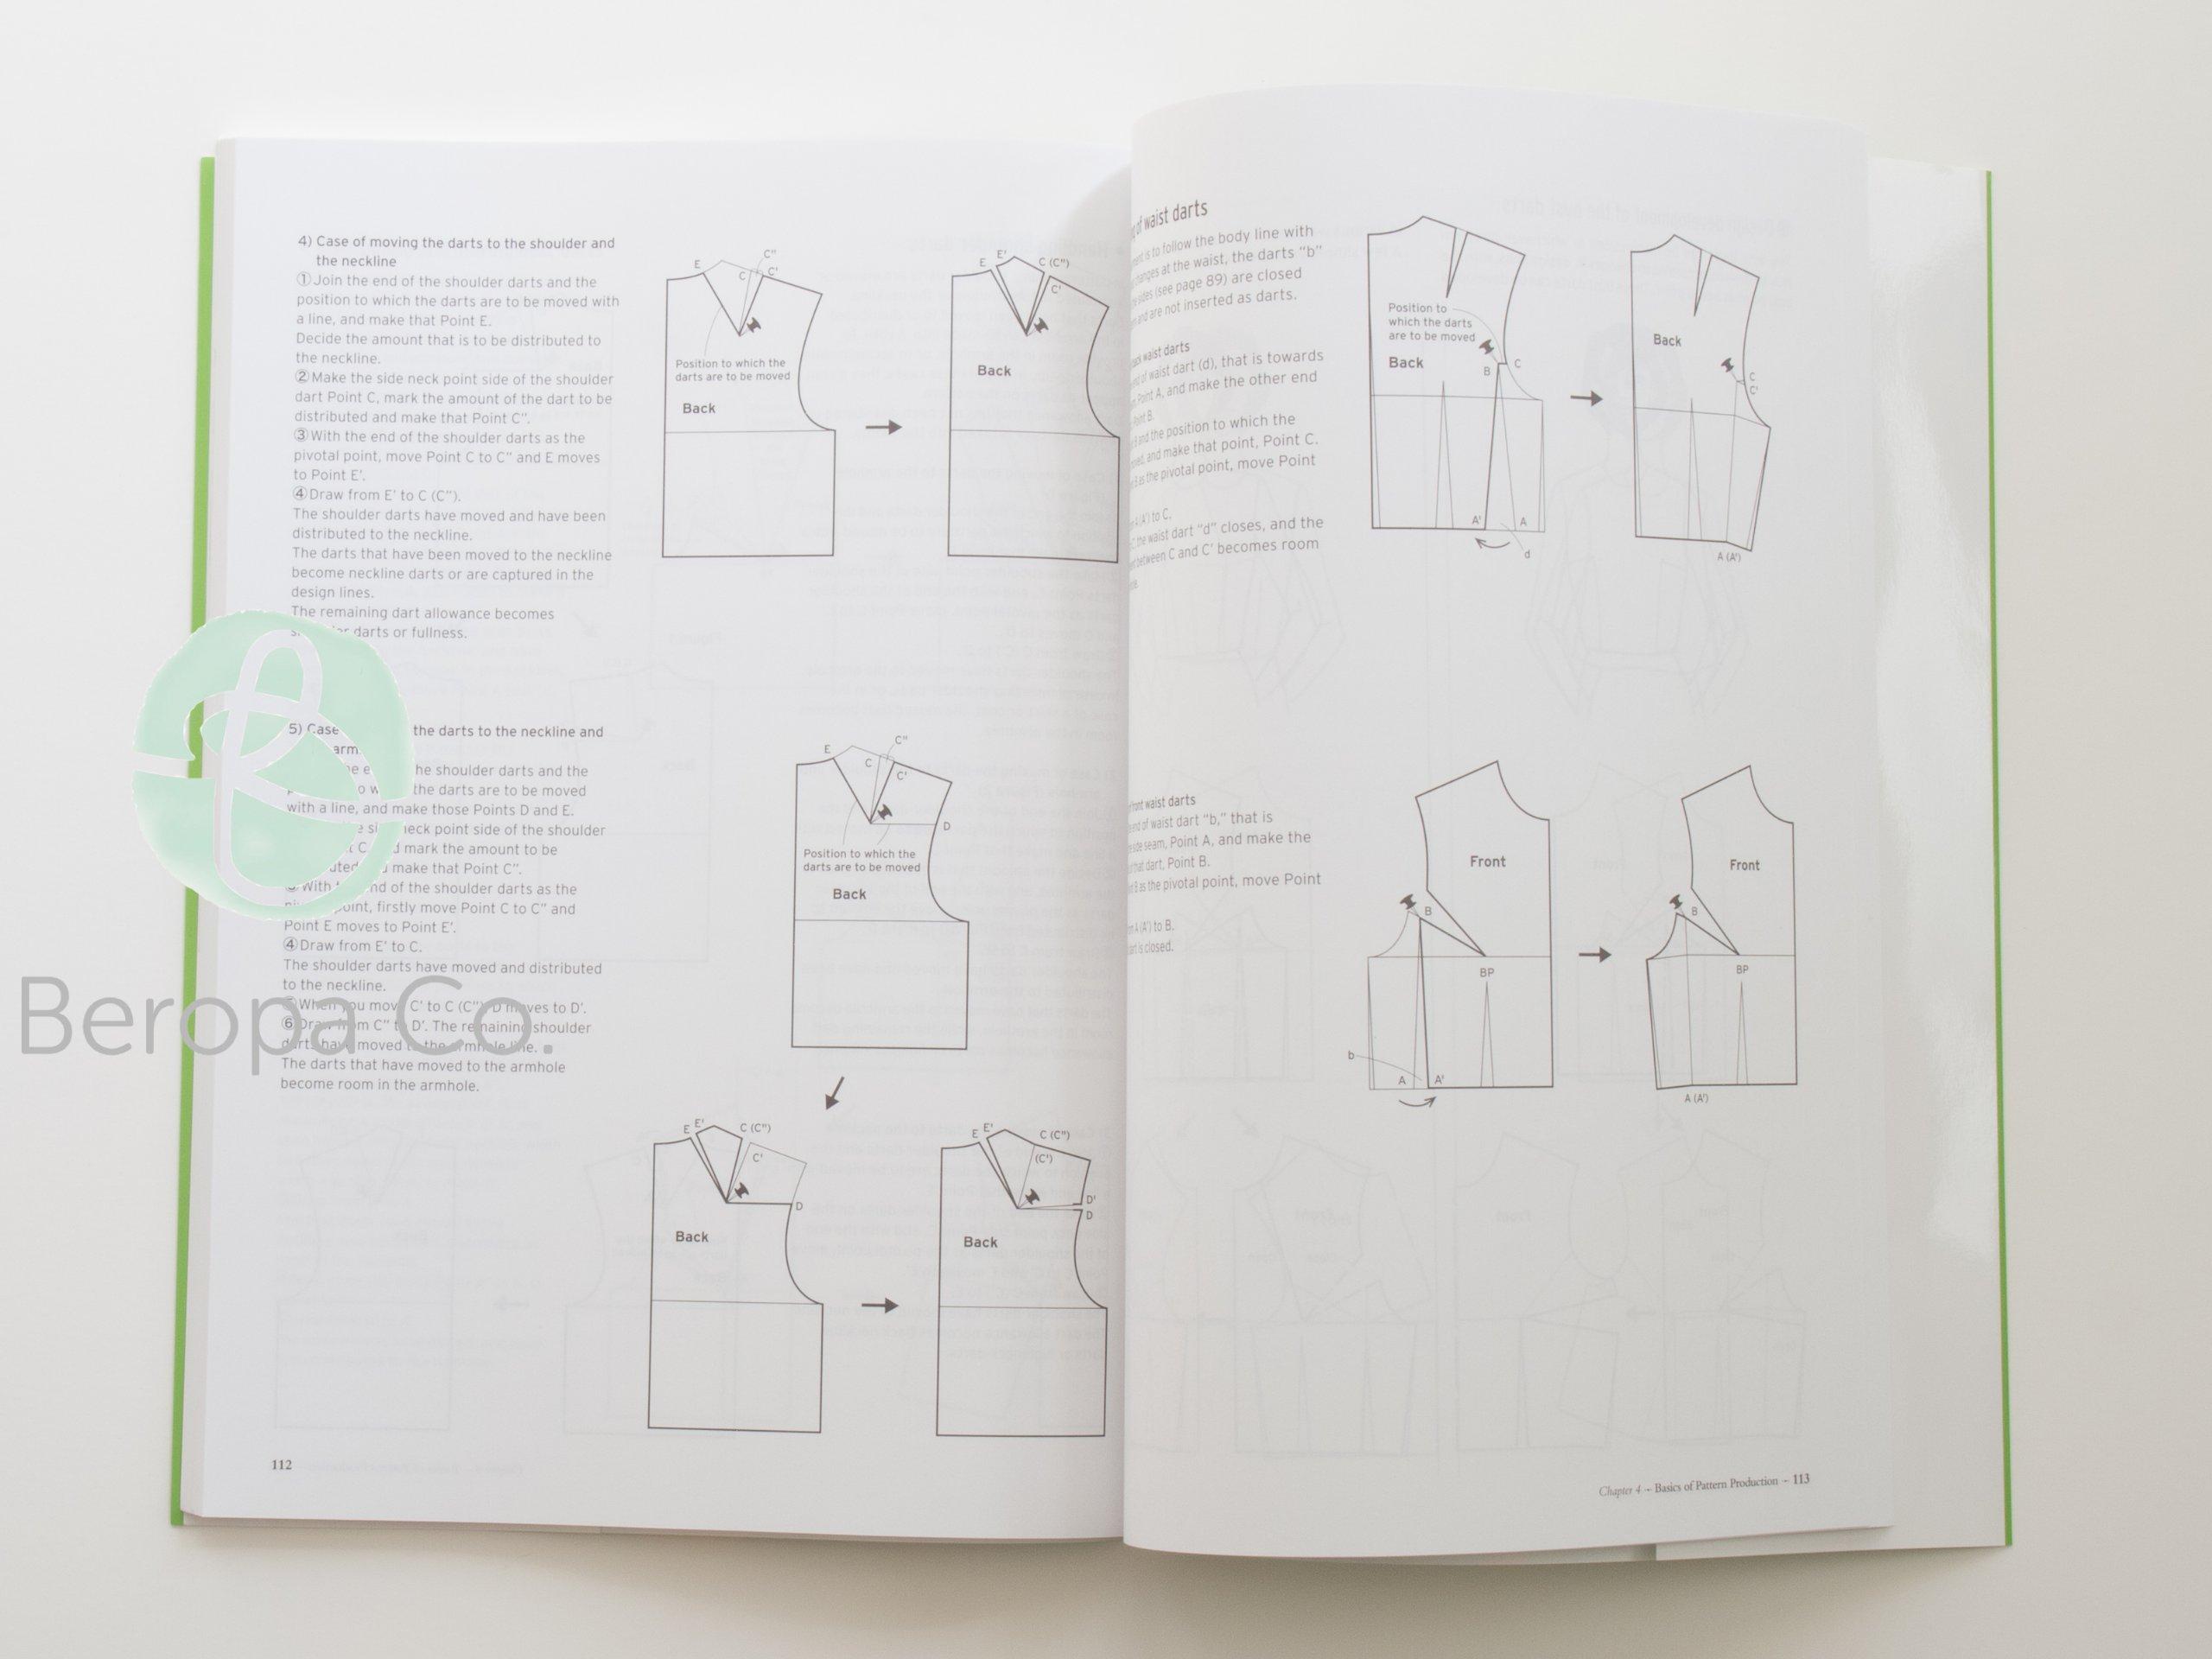 Bunka Fashion Series Garment Design Textbook 1 Fundamentals Of Garment Design Bunka Fashion College 9784579112388 Amazon Com Books